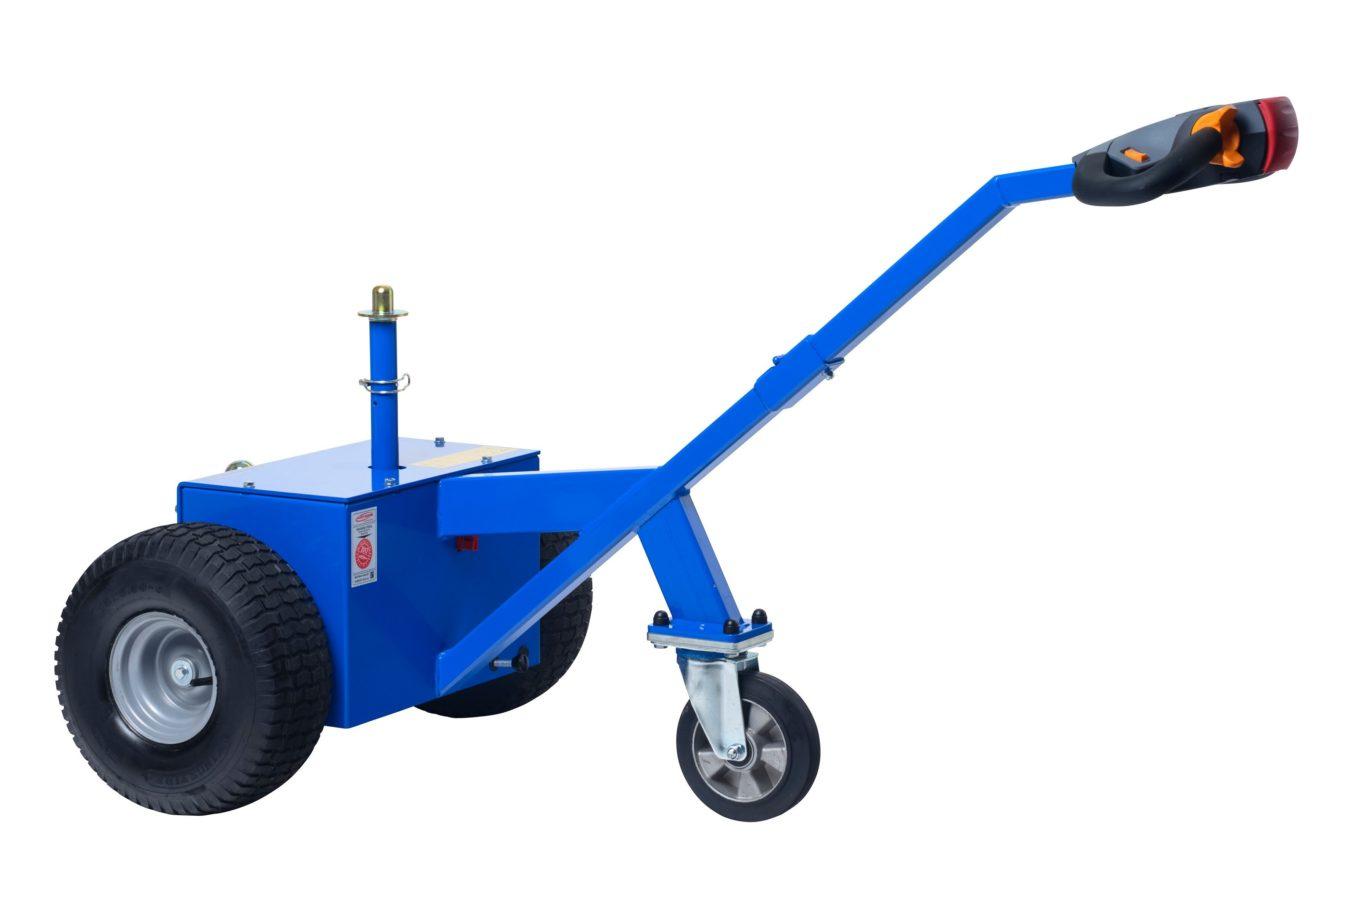 Multi-Mover-Modell M18